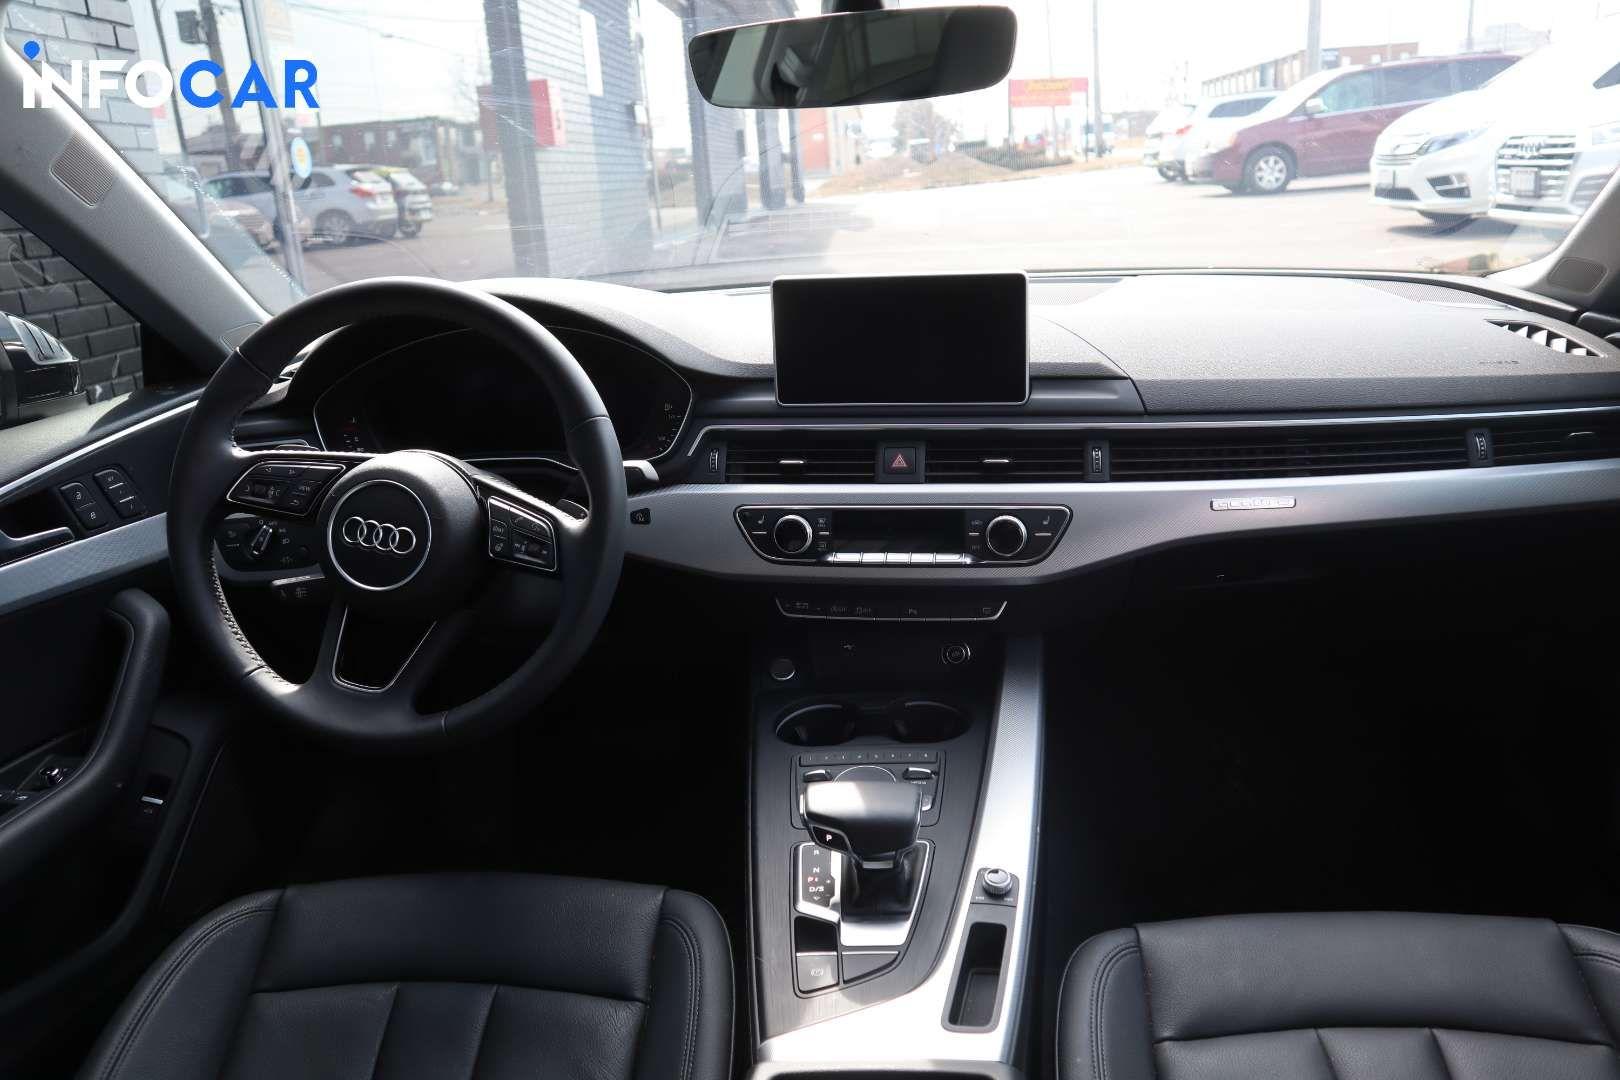 2019 Audi A5 SPORTBACK - INFOCAR - Toronto's Most Comprehensive New and Used Auto Trading Platform